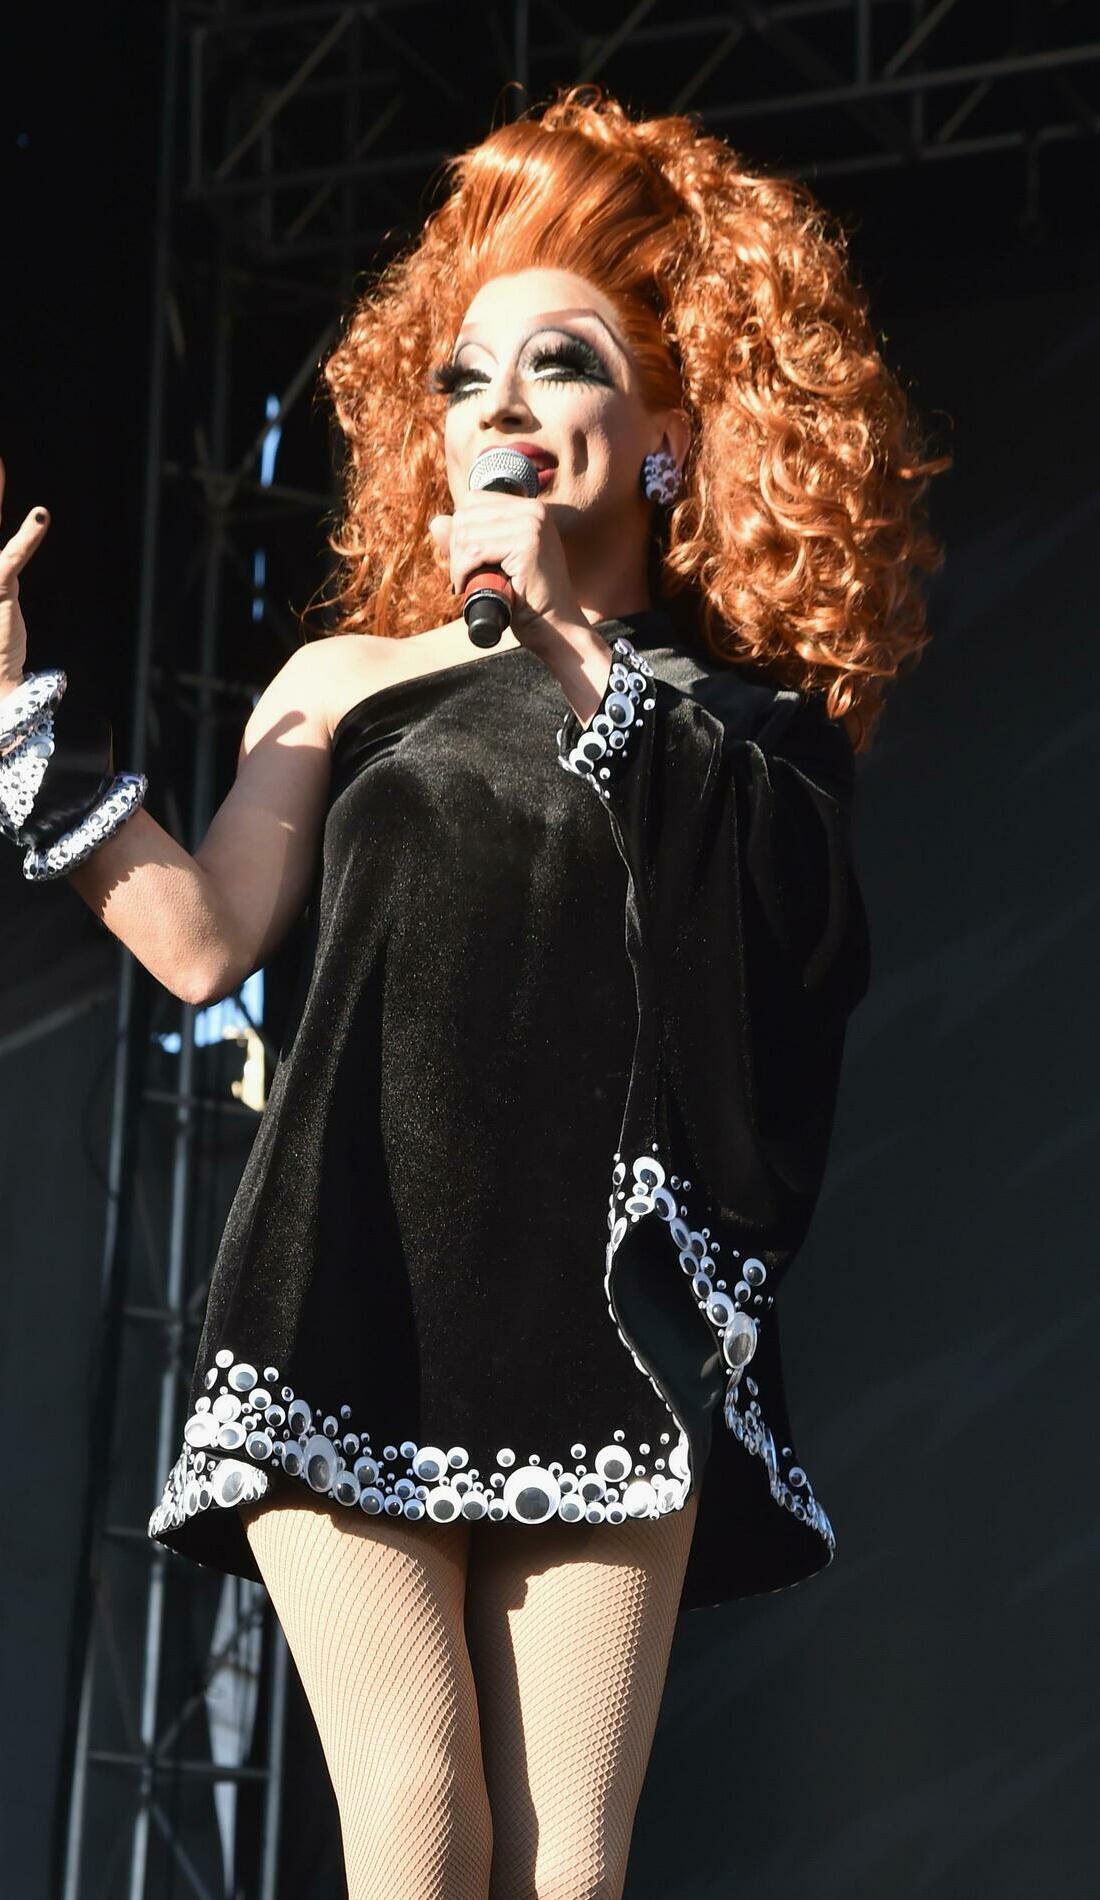 A Bianca Del Rio live event